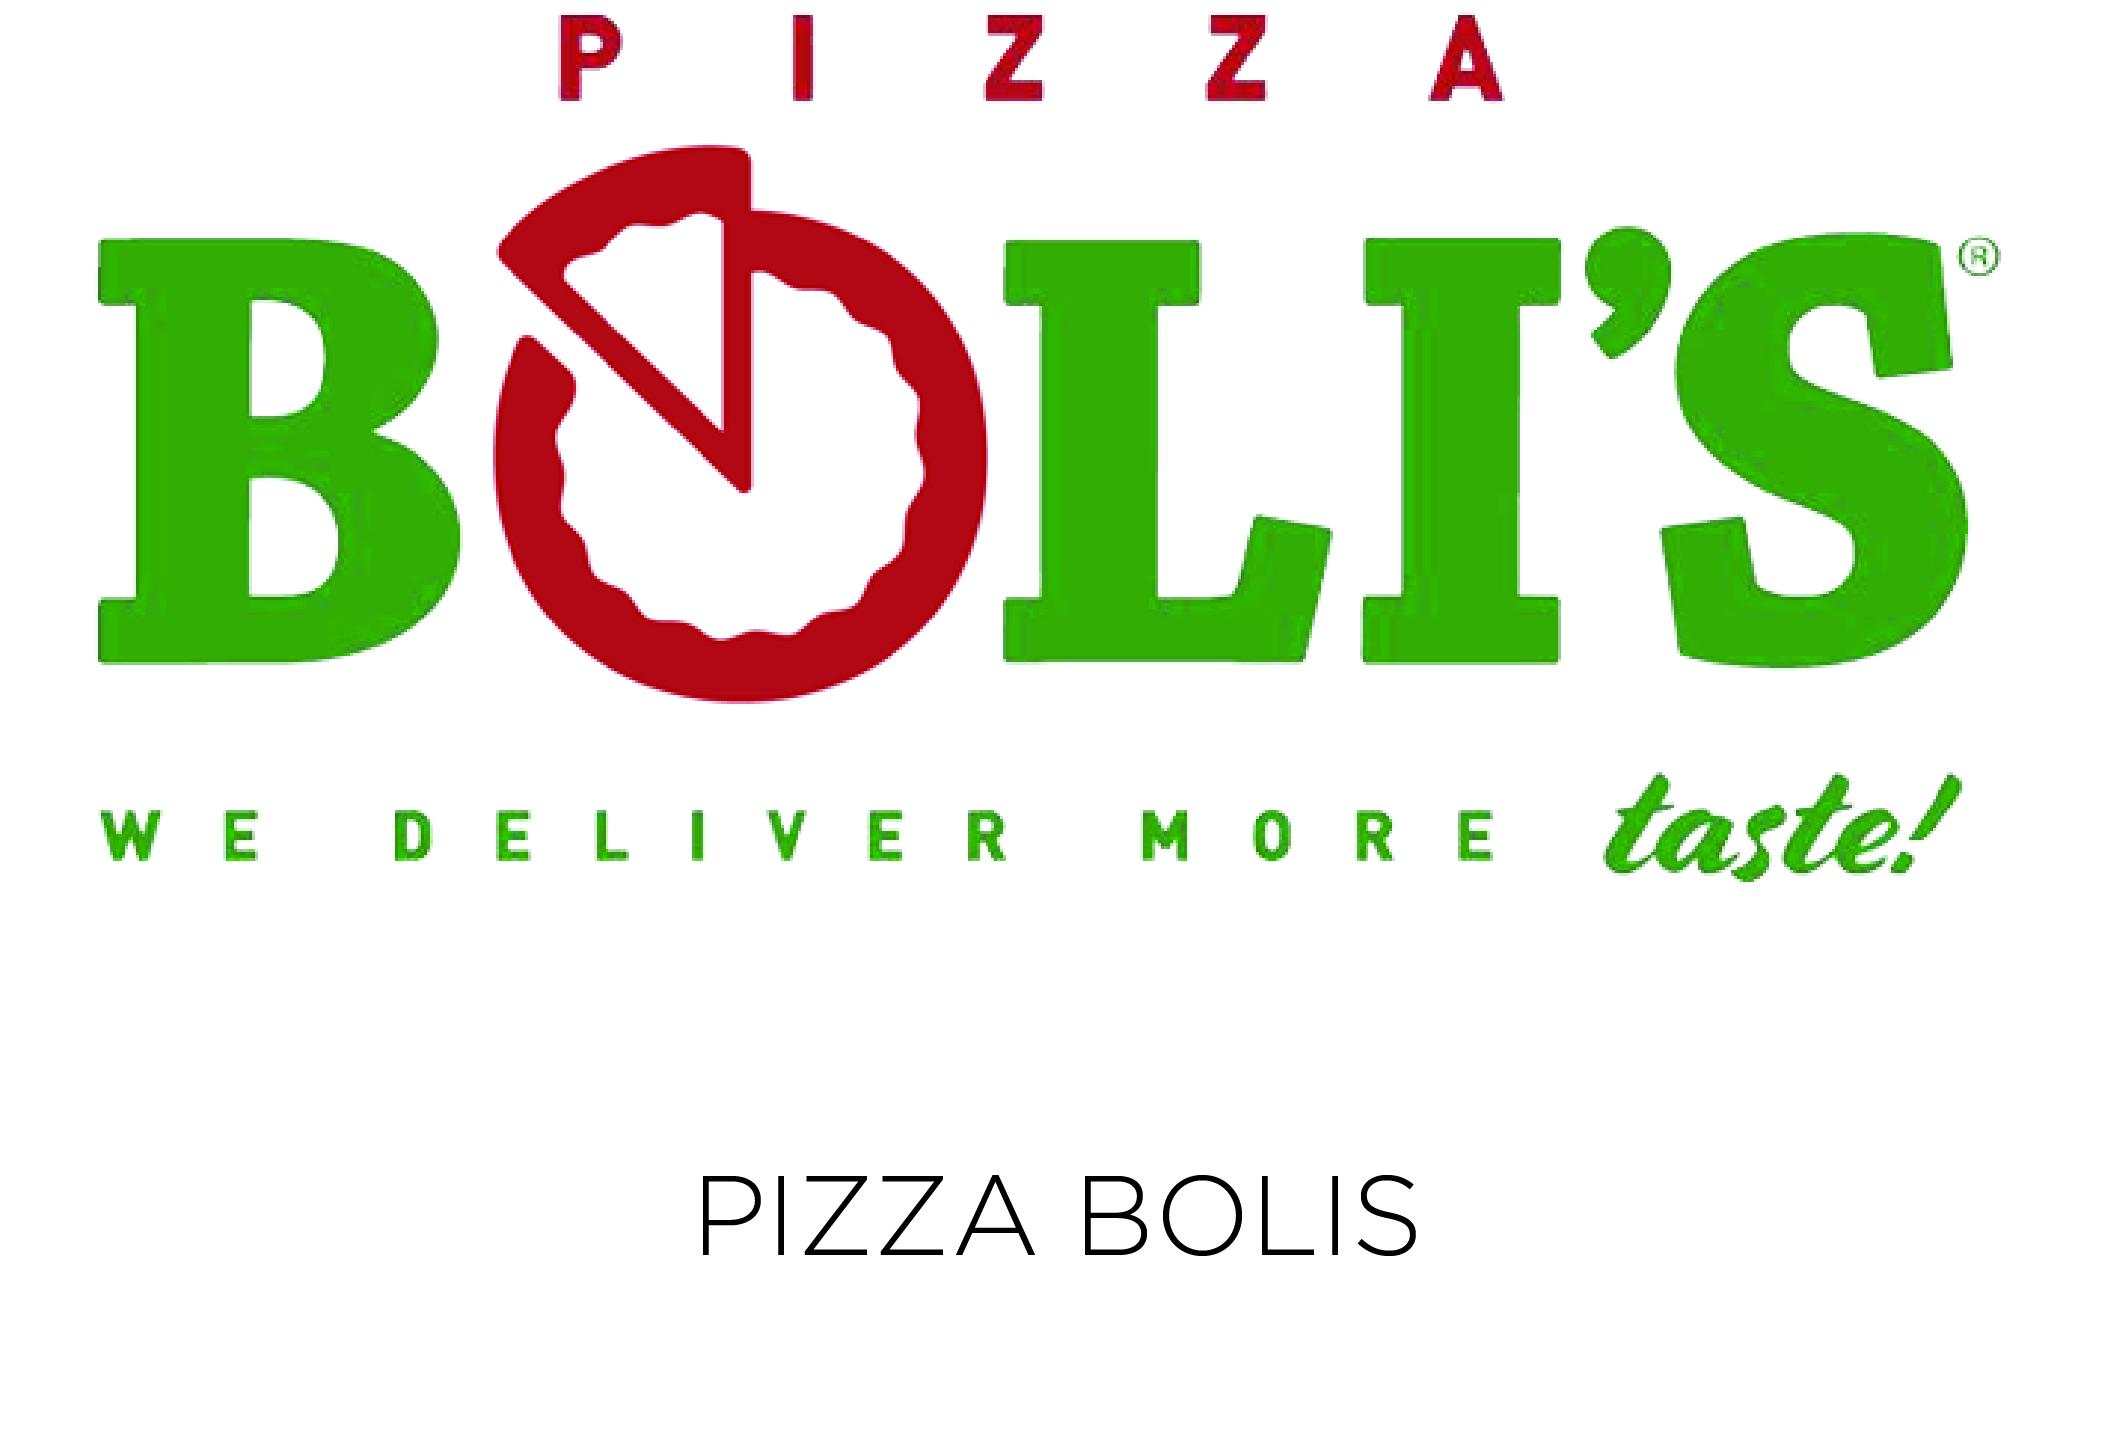 pizzabolis.jpg